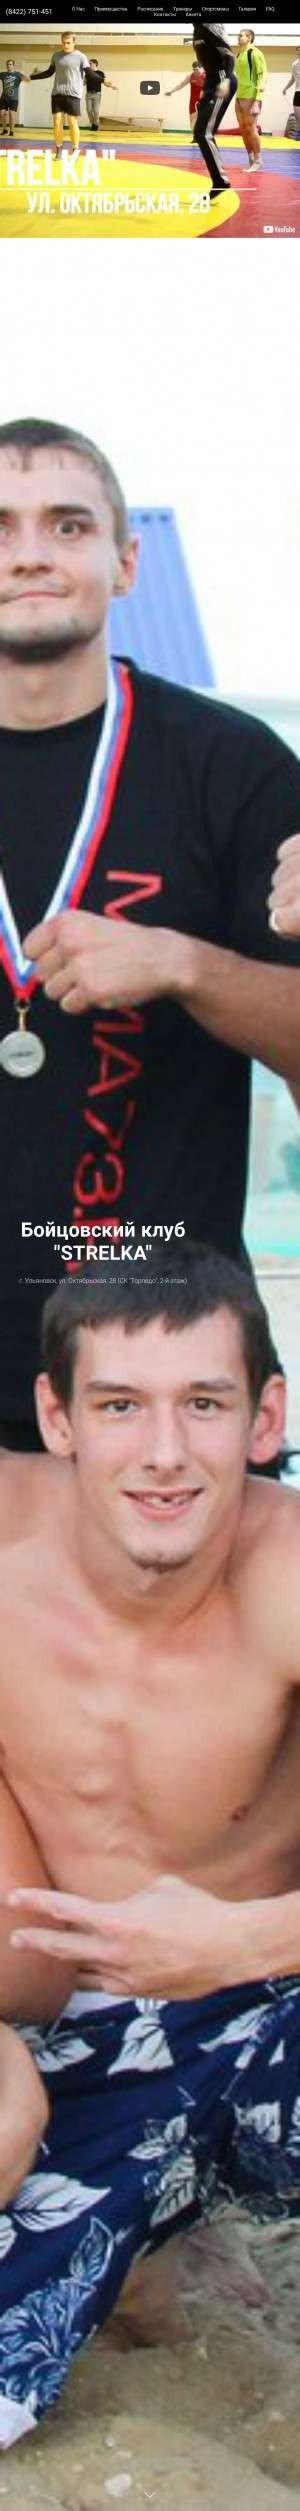 Предпросмотр для mma73.ru — БК Стрелка